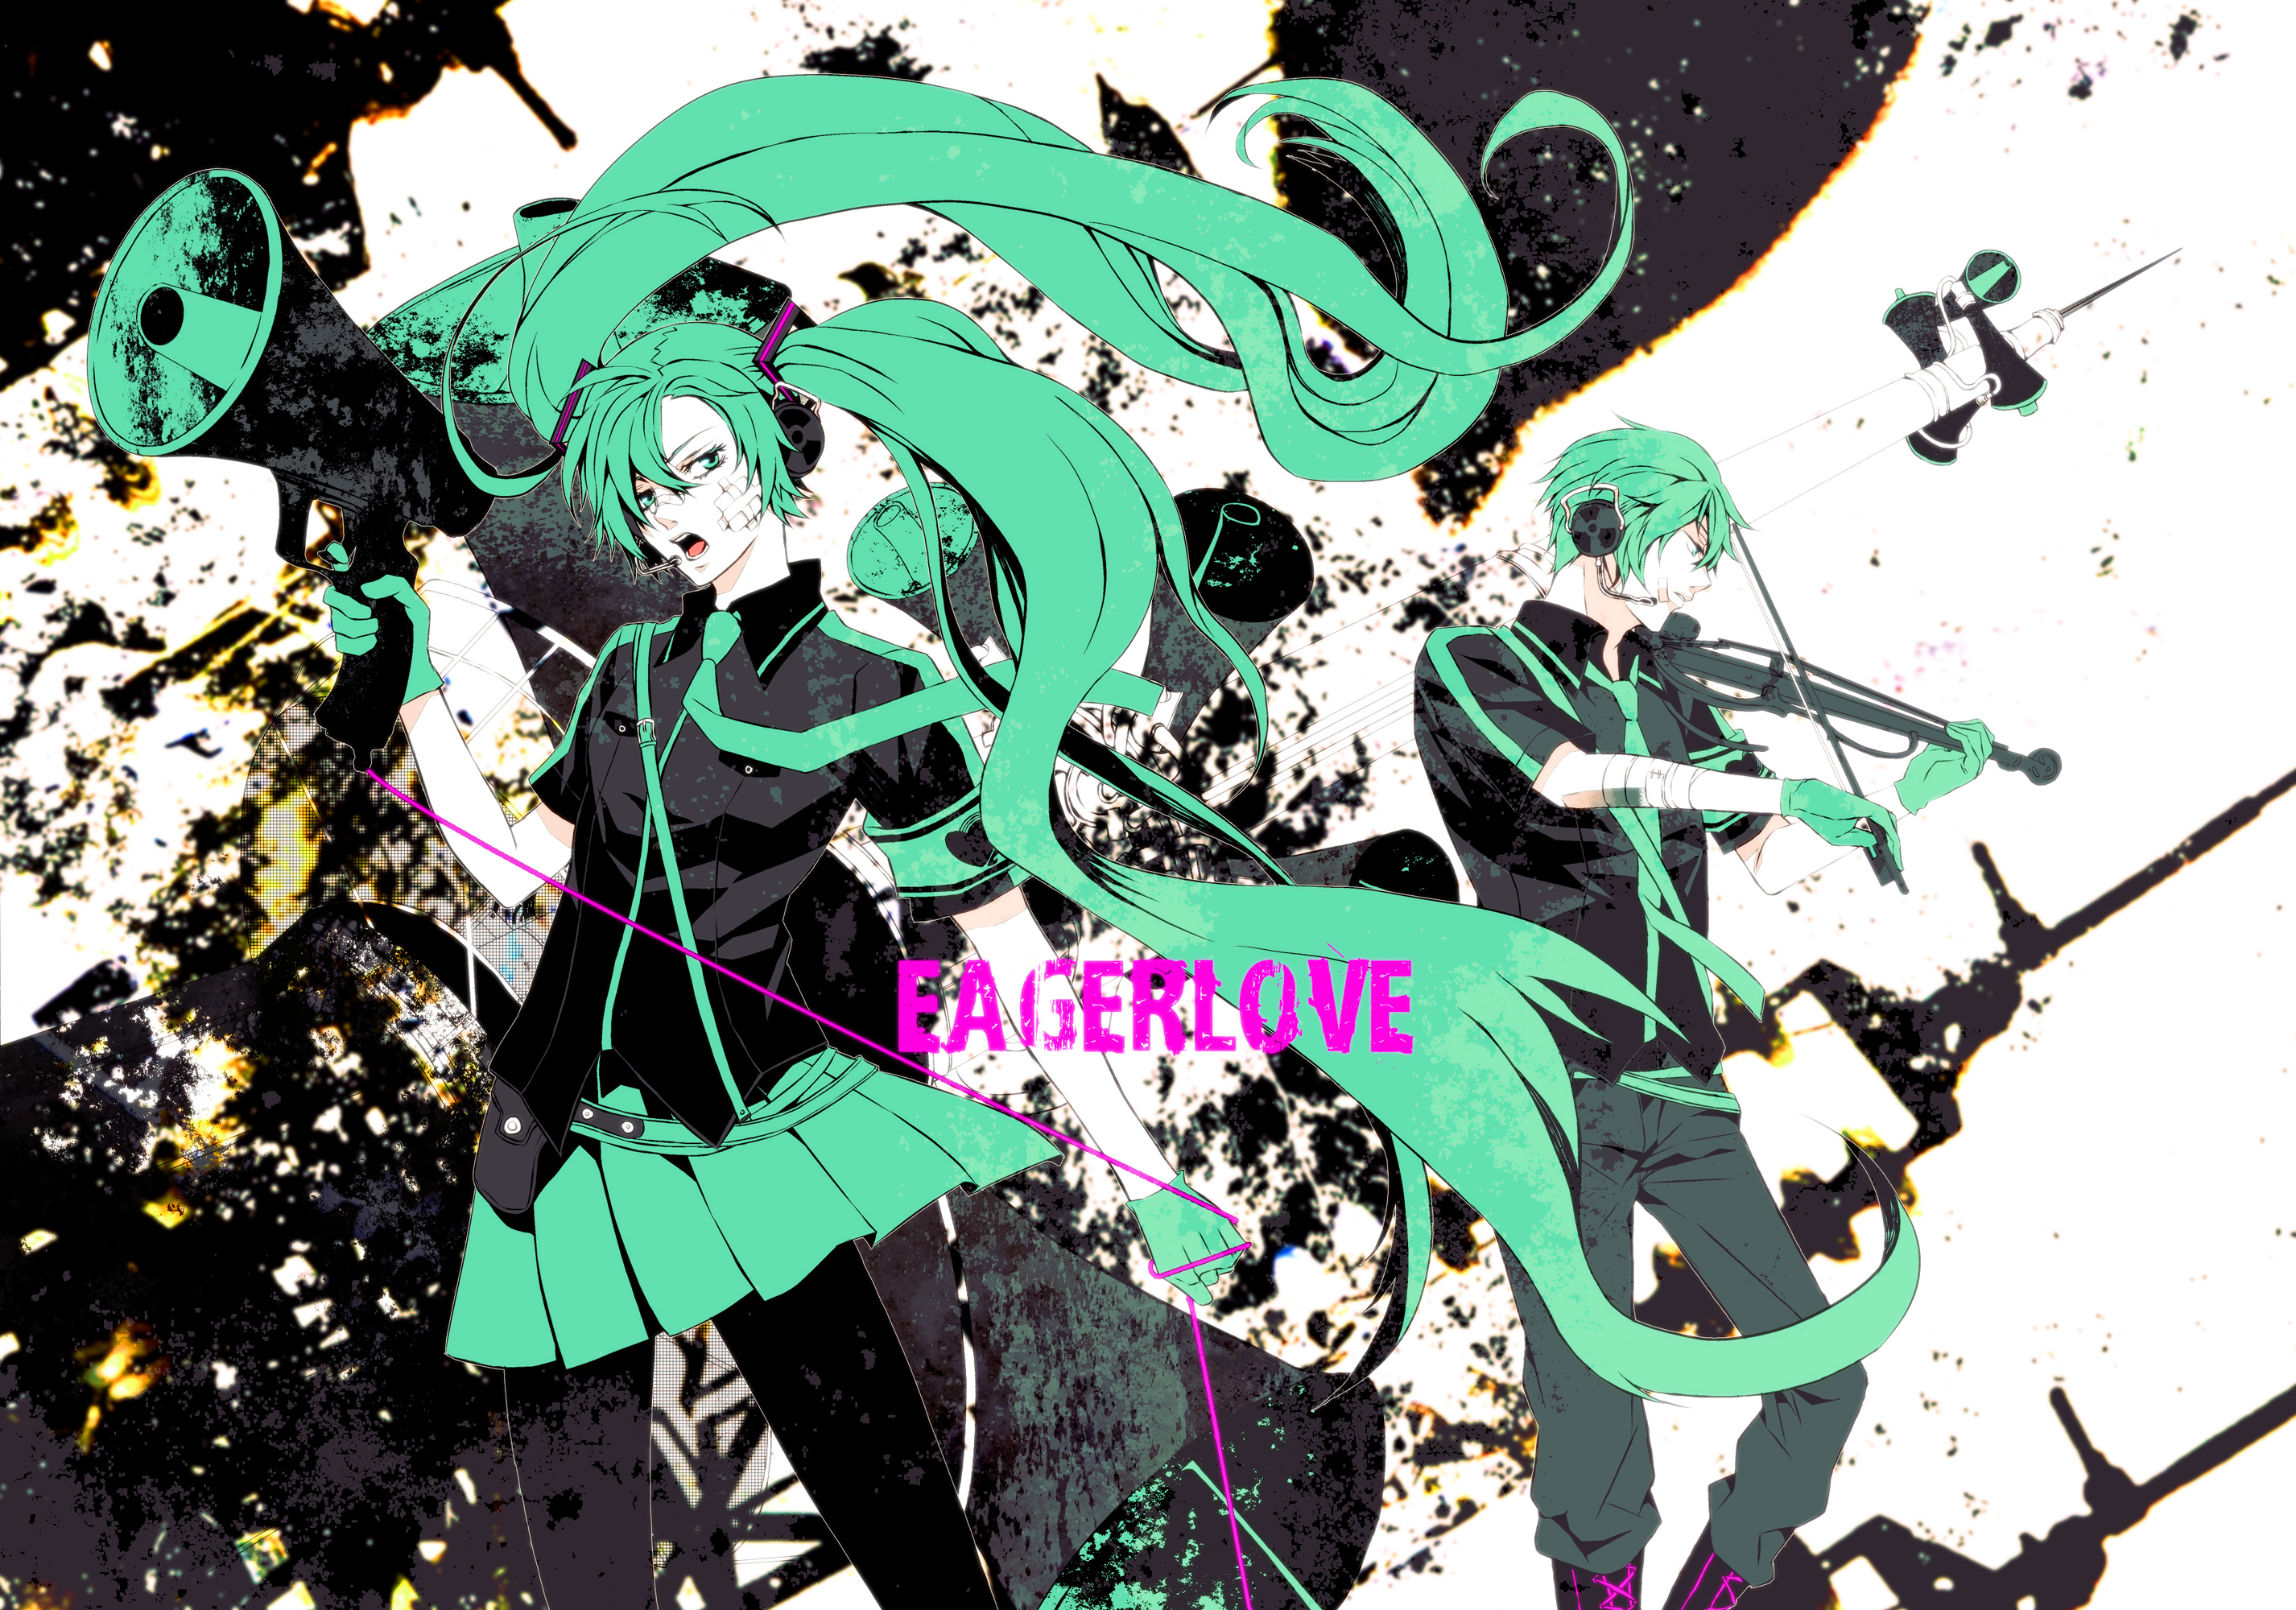 Vocaloid hd wallpaper background image 2852x2000 id - Anime war wallpaper ...